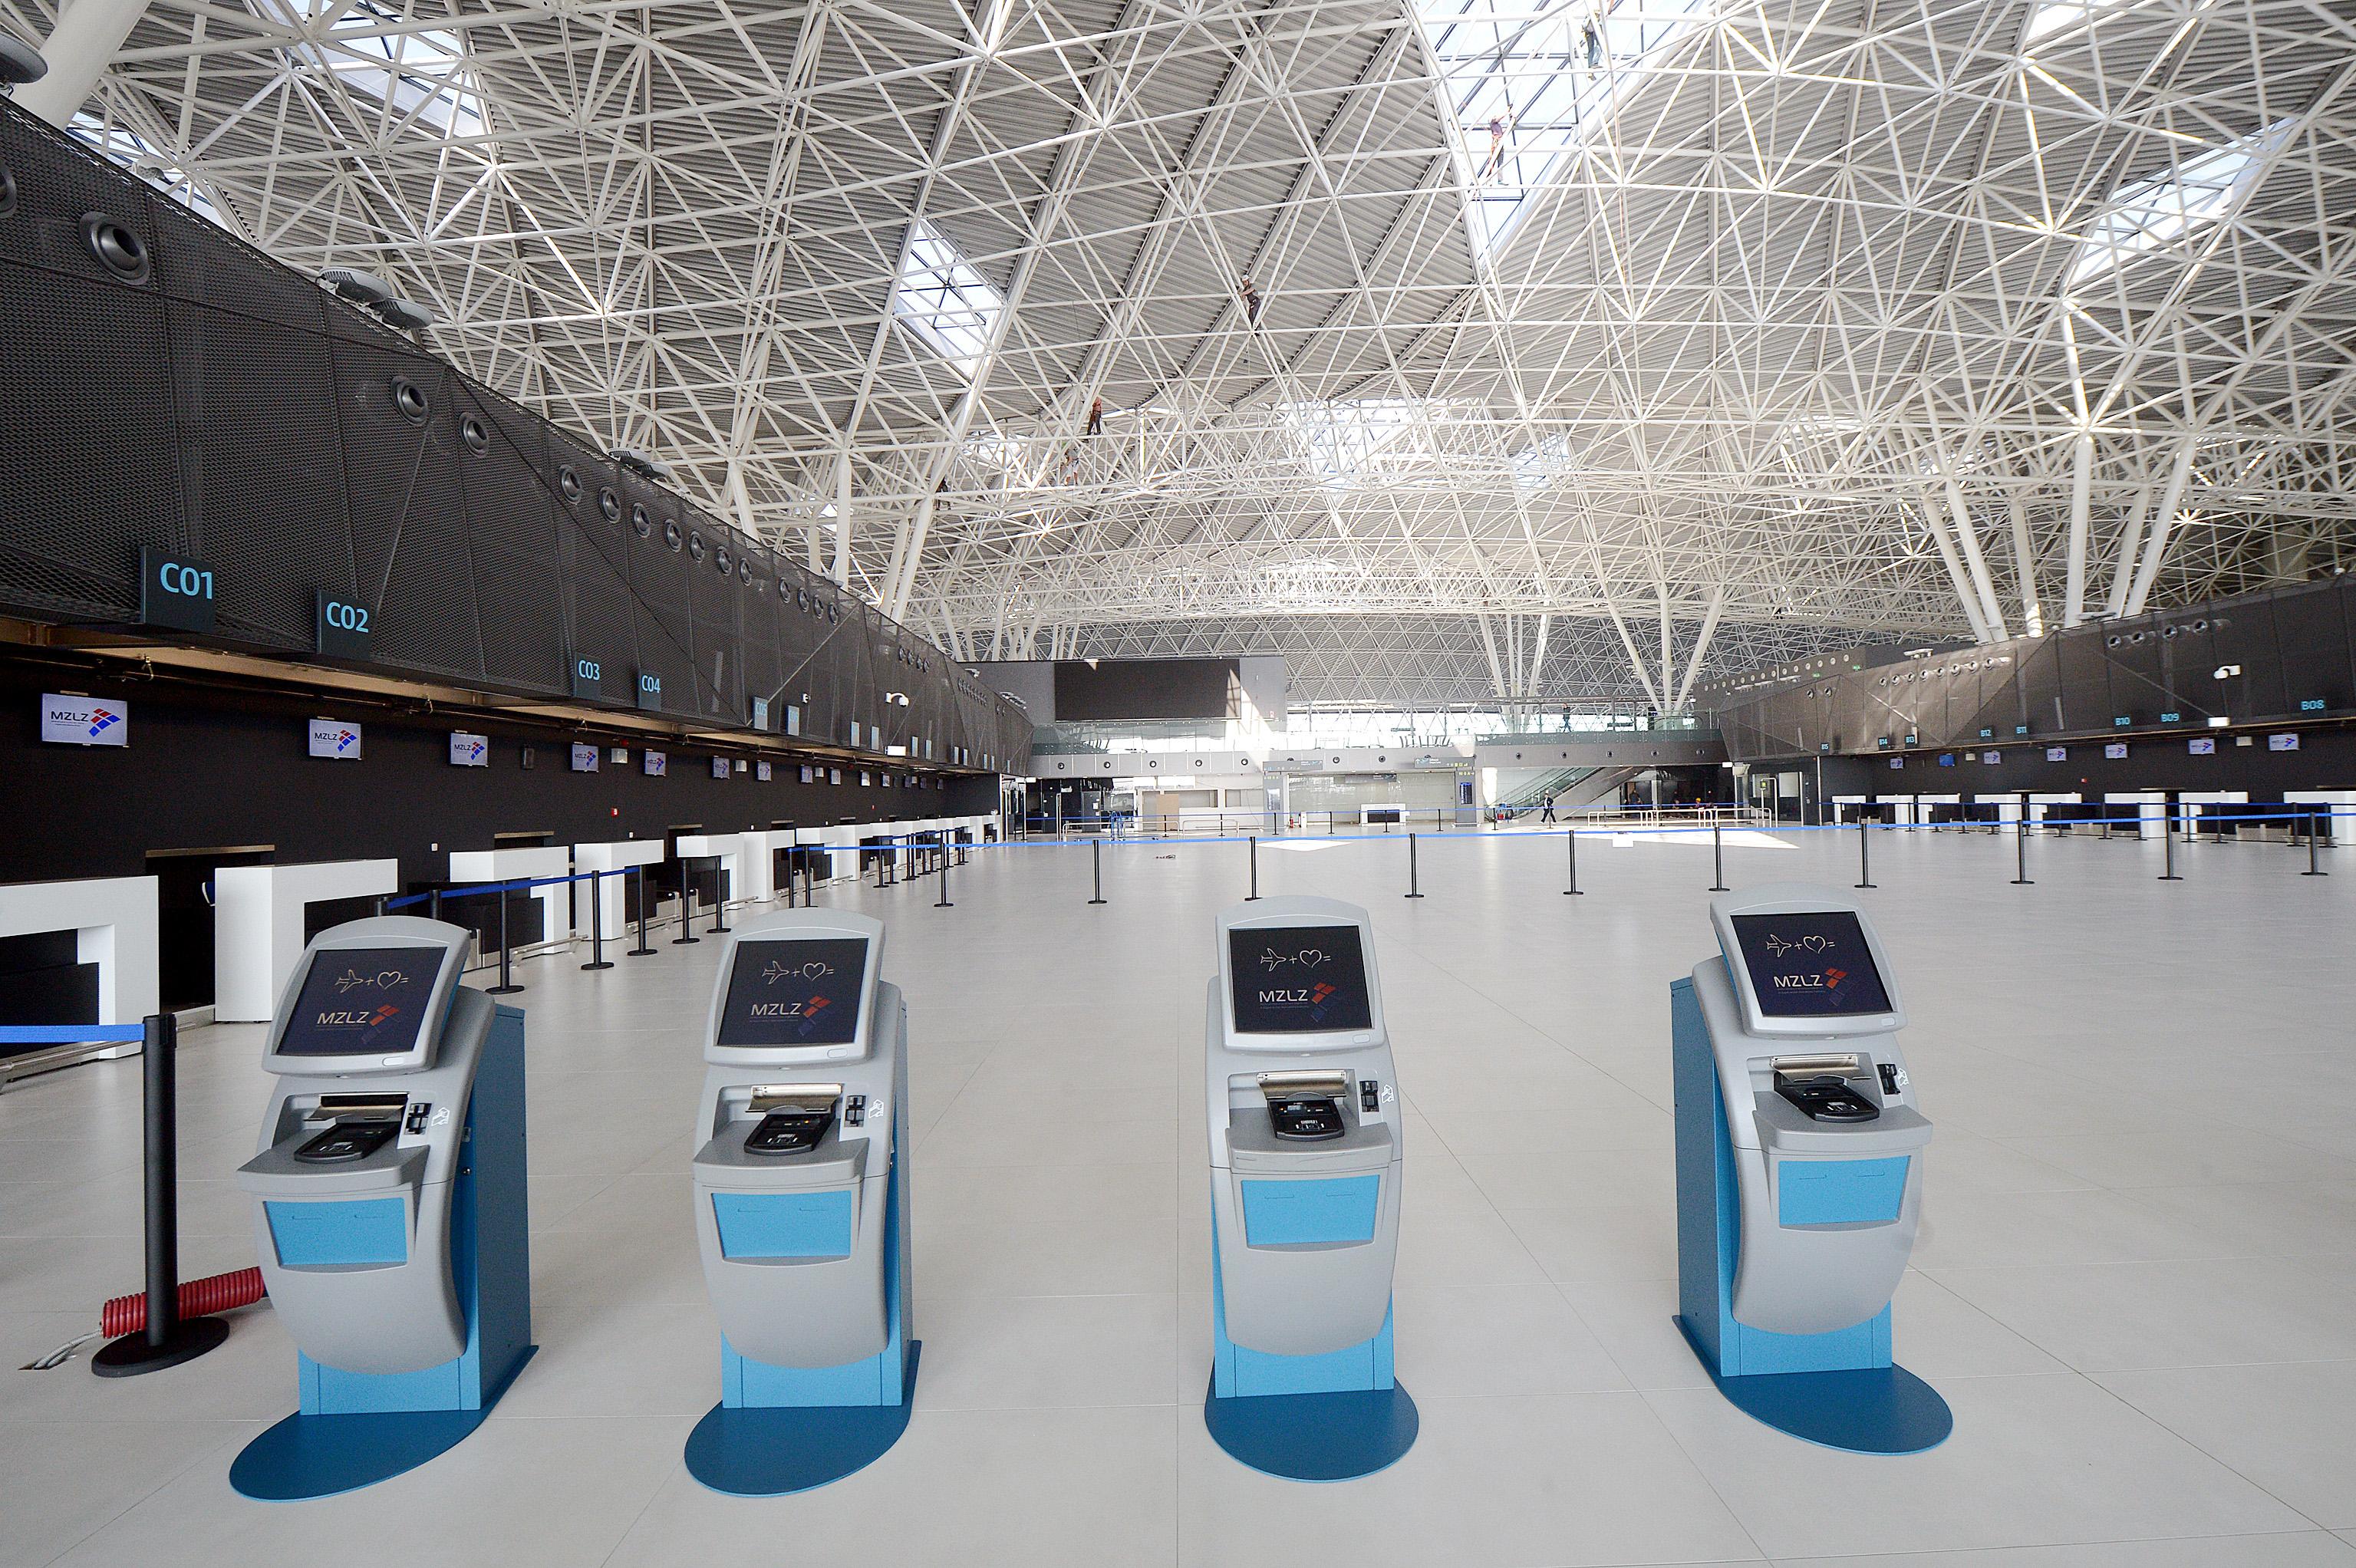 Zracna Luka Franjo Tuđman Pogledajte Impresivni Novi Terminal Zagrebackog Aerodroma Novi List